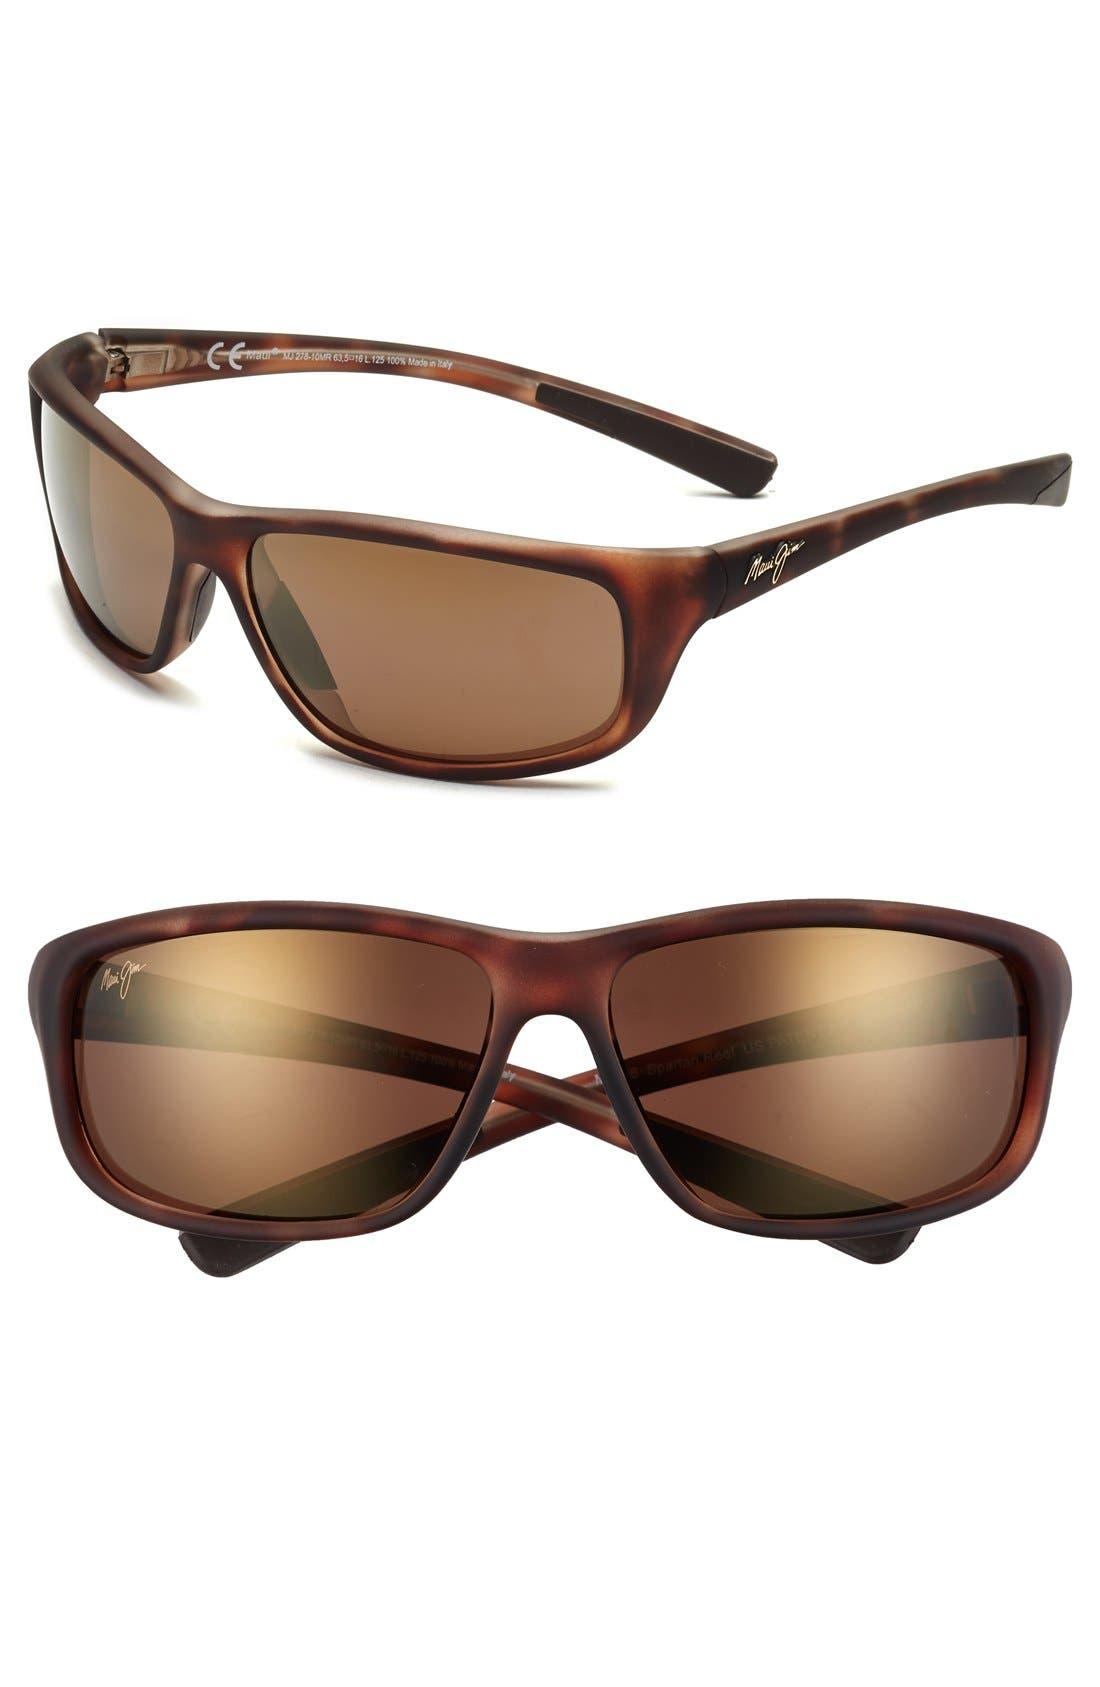 03fe846d6b85 Maui Jim 'Spartan Reef - Polarizedplus2' Sunglasses -